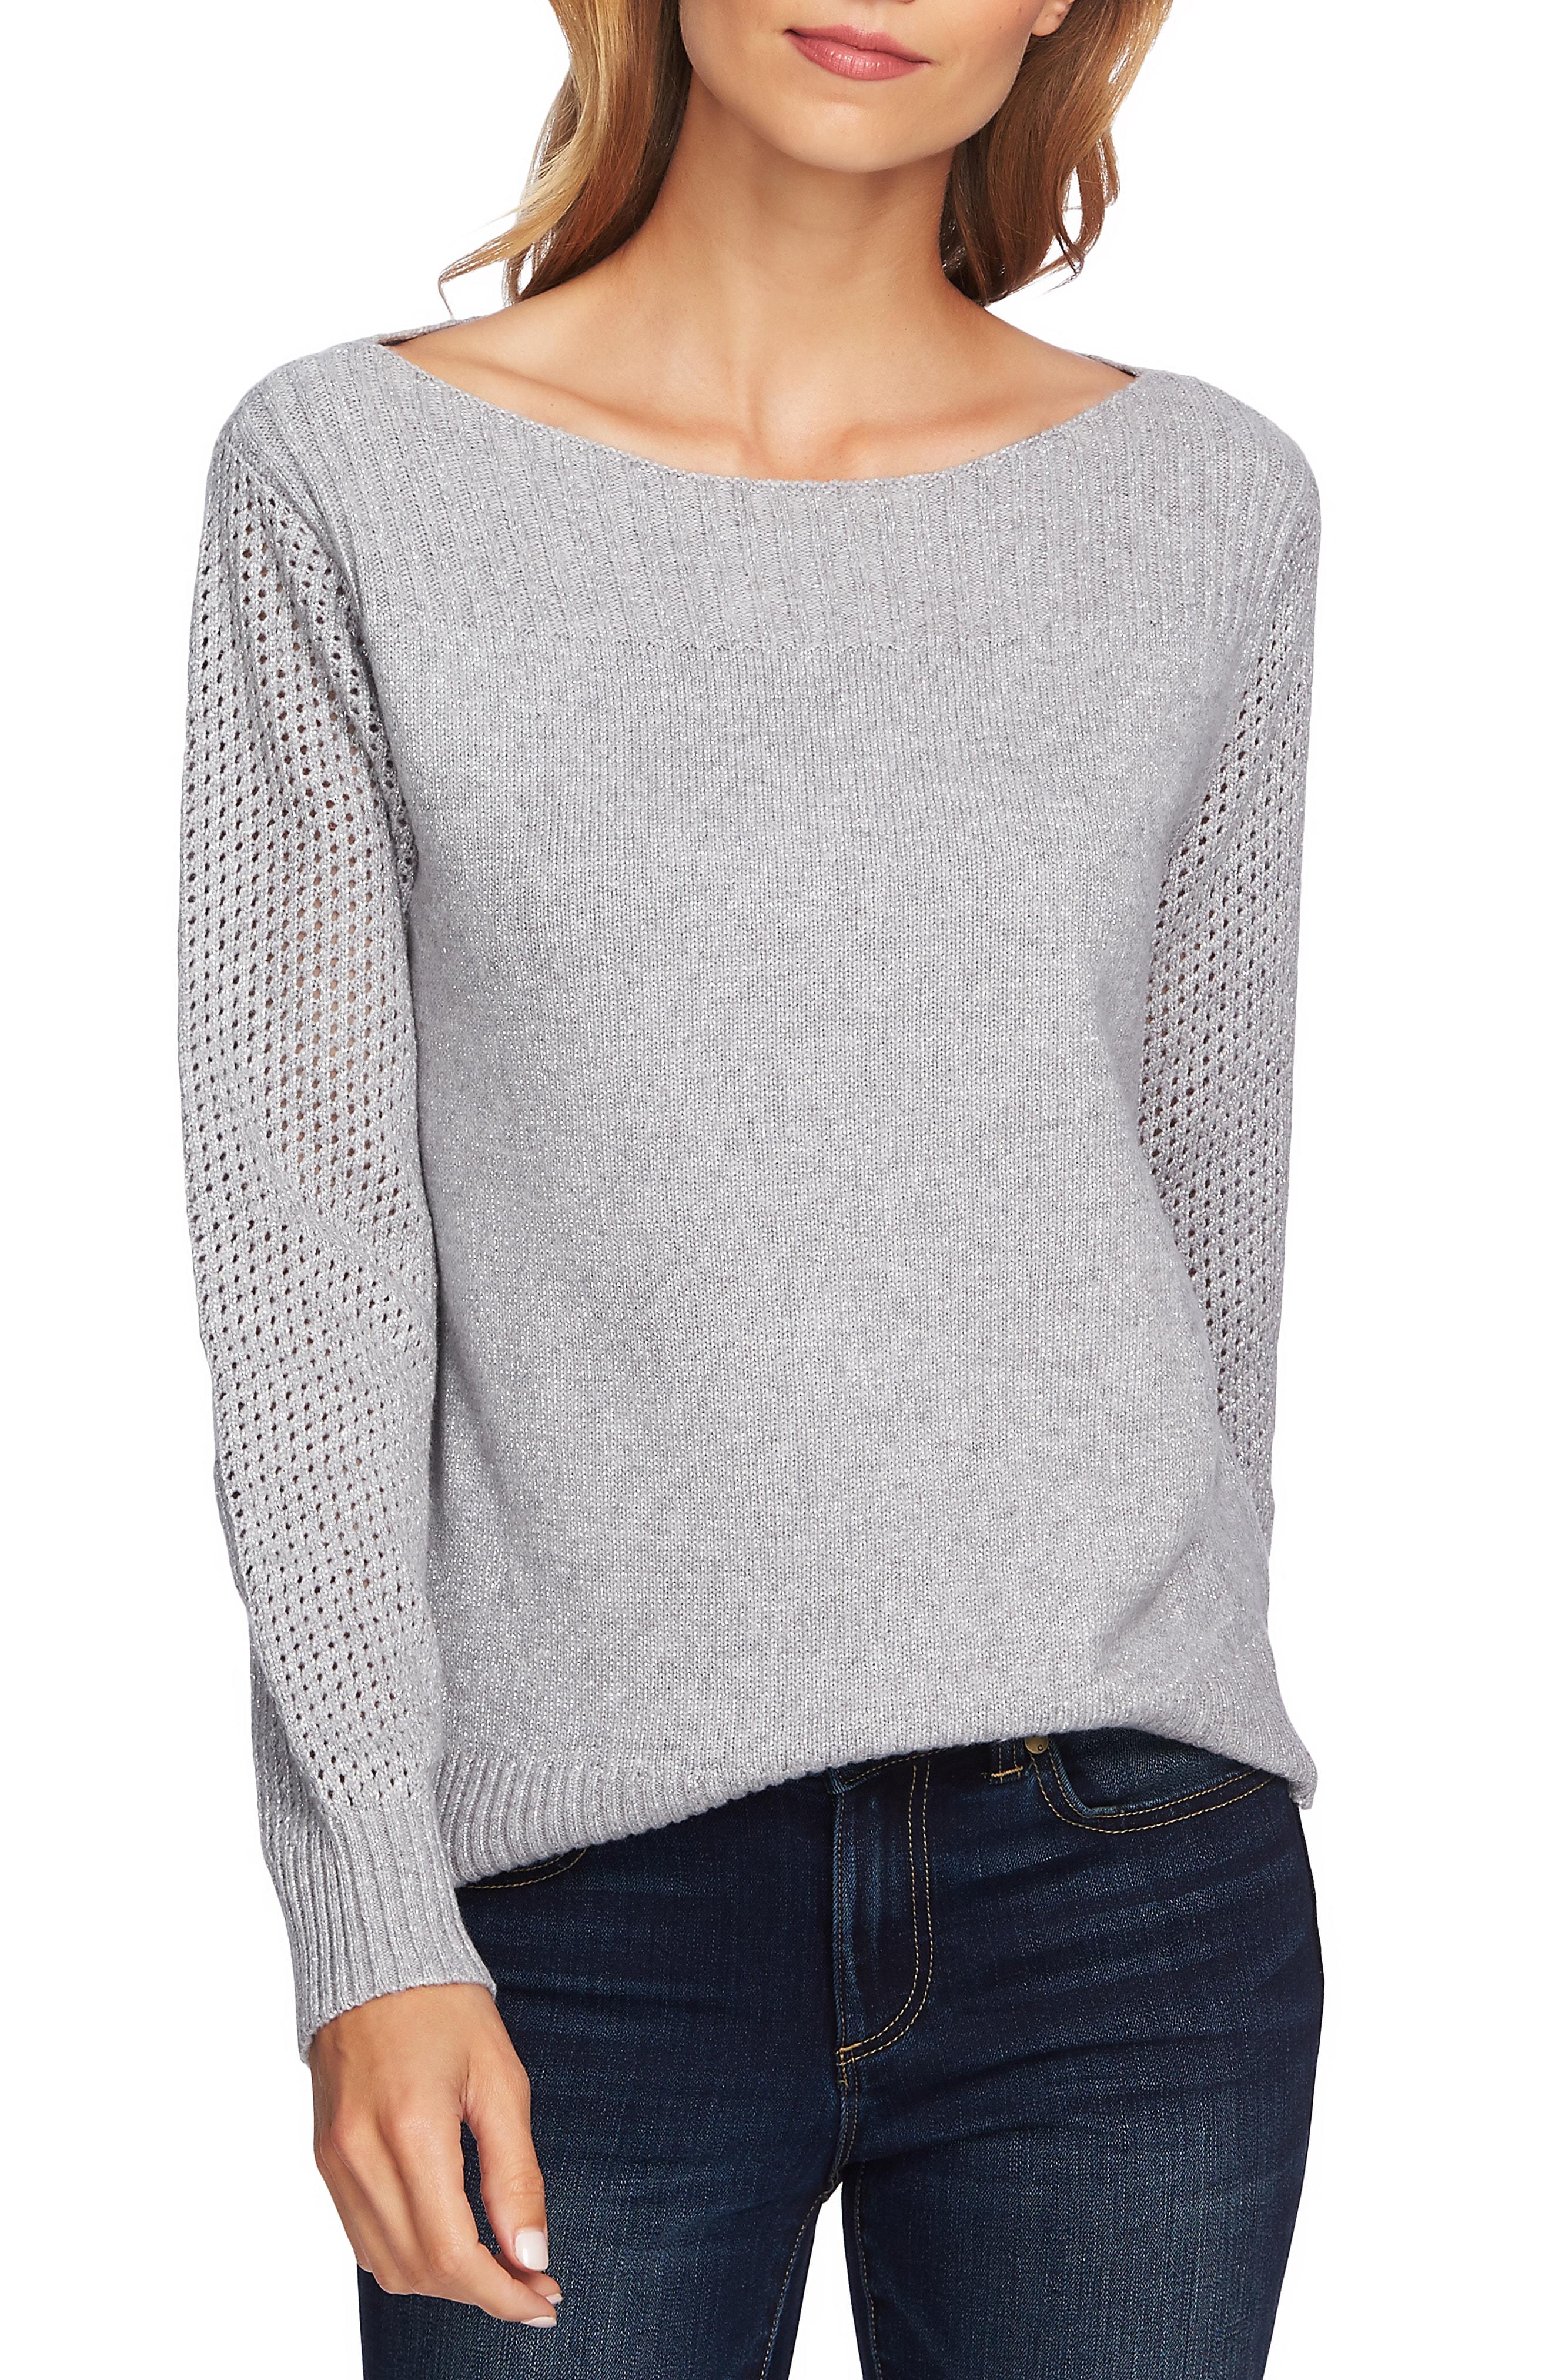 CeCe Metallic Knit Sweater